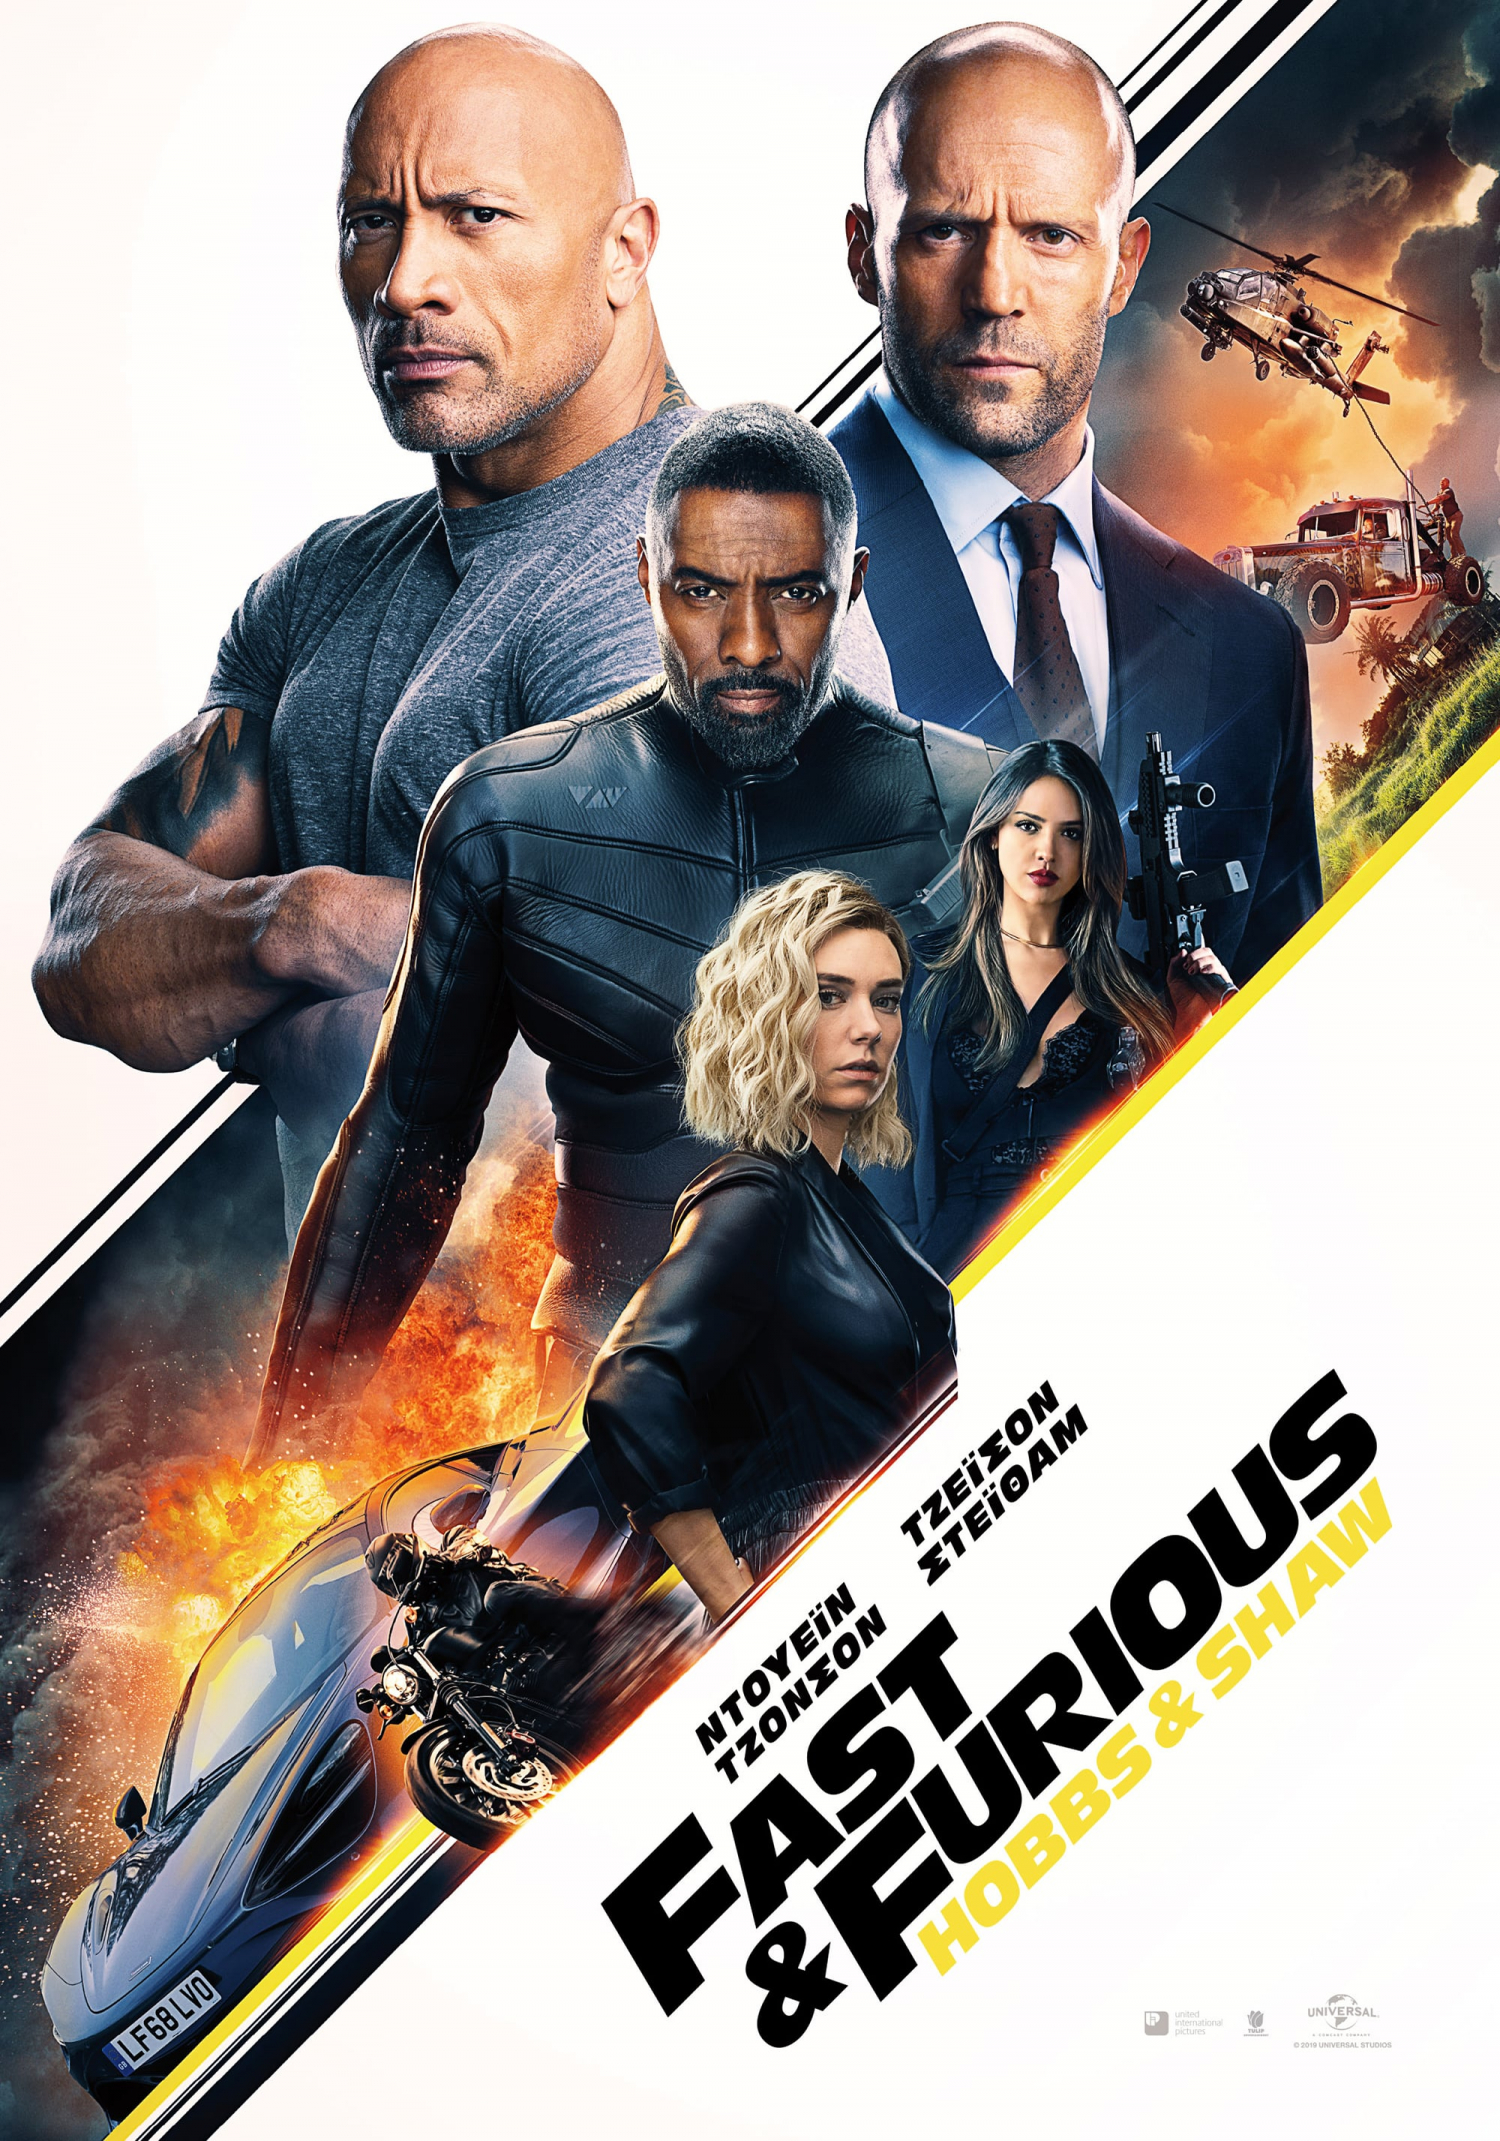 Fast & Furious - Hobbs & Shaw' - David Leitch